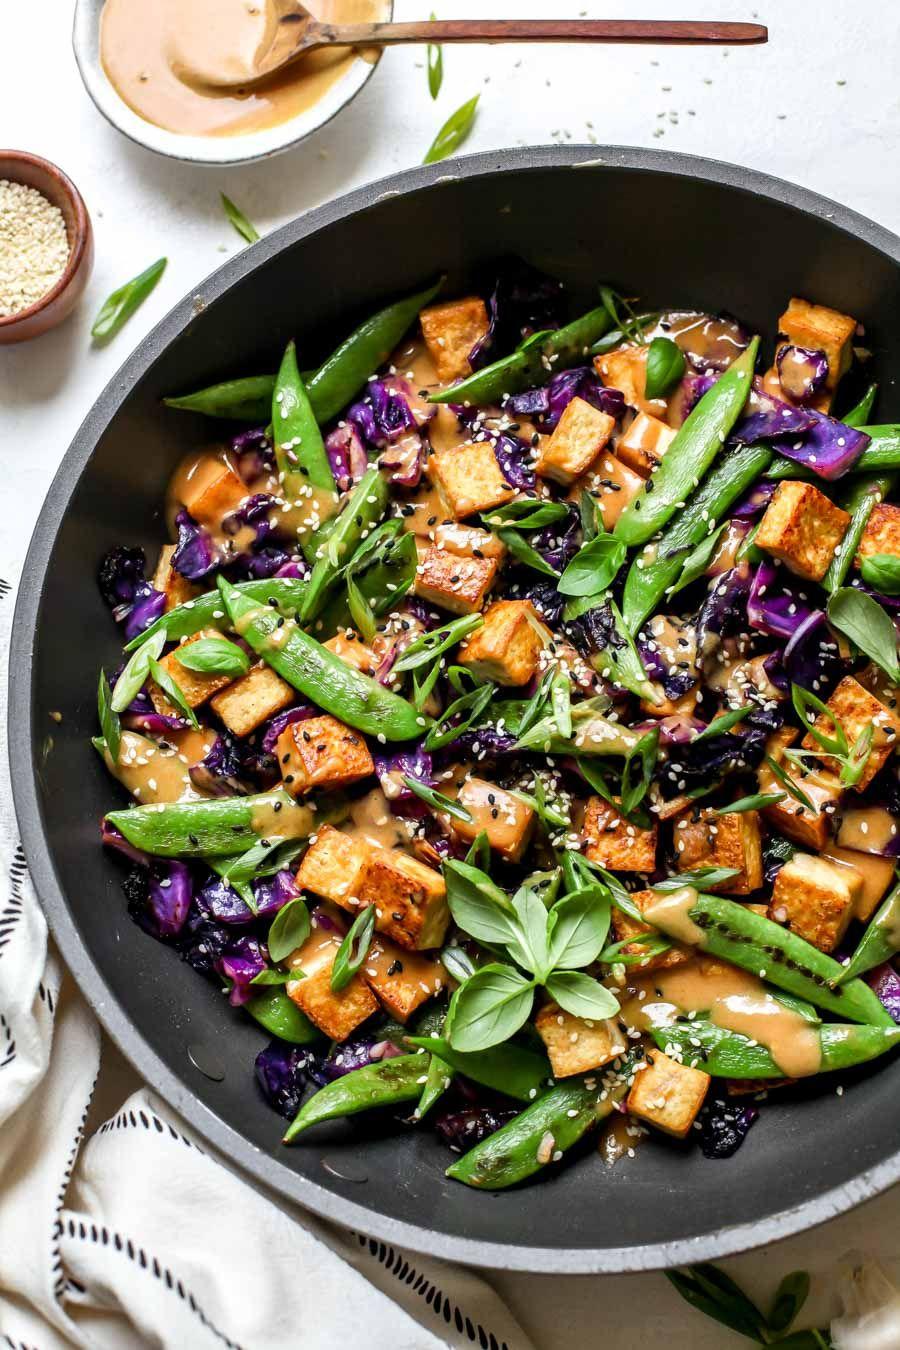 Easy Tofu Stir Fry With Peanut Satay Sauce Recipe Tofu Stir Fry Tofu Recipes Healthy